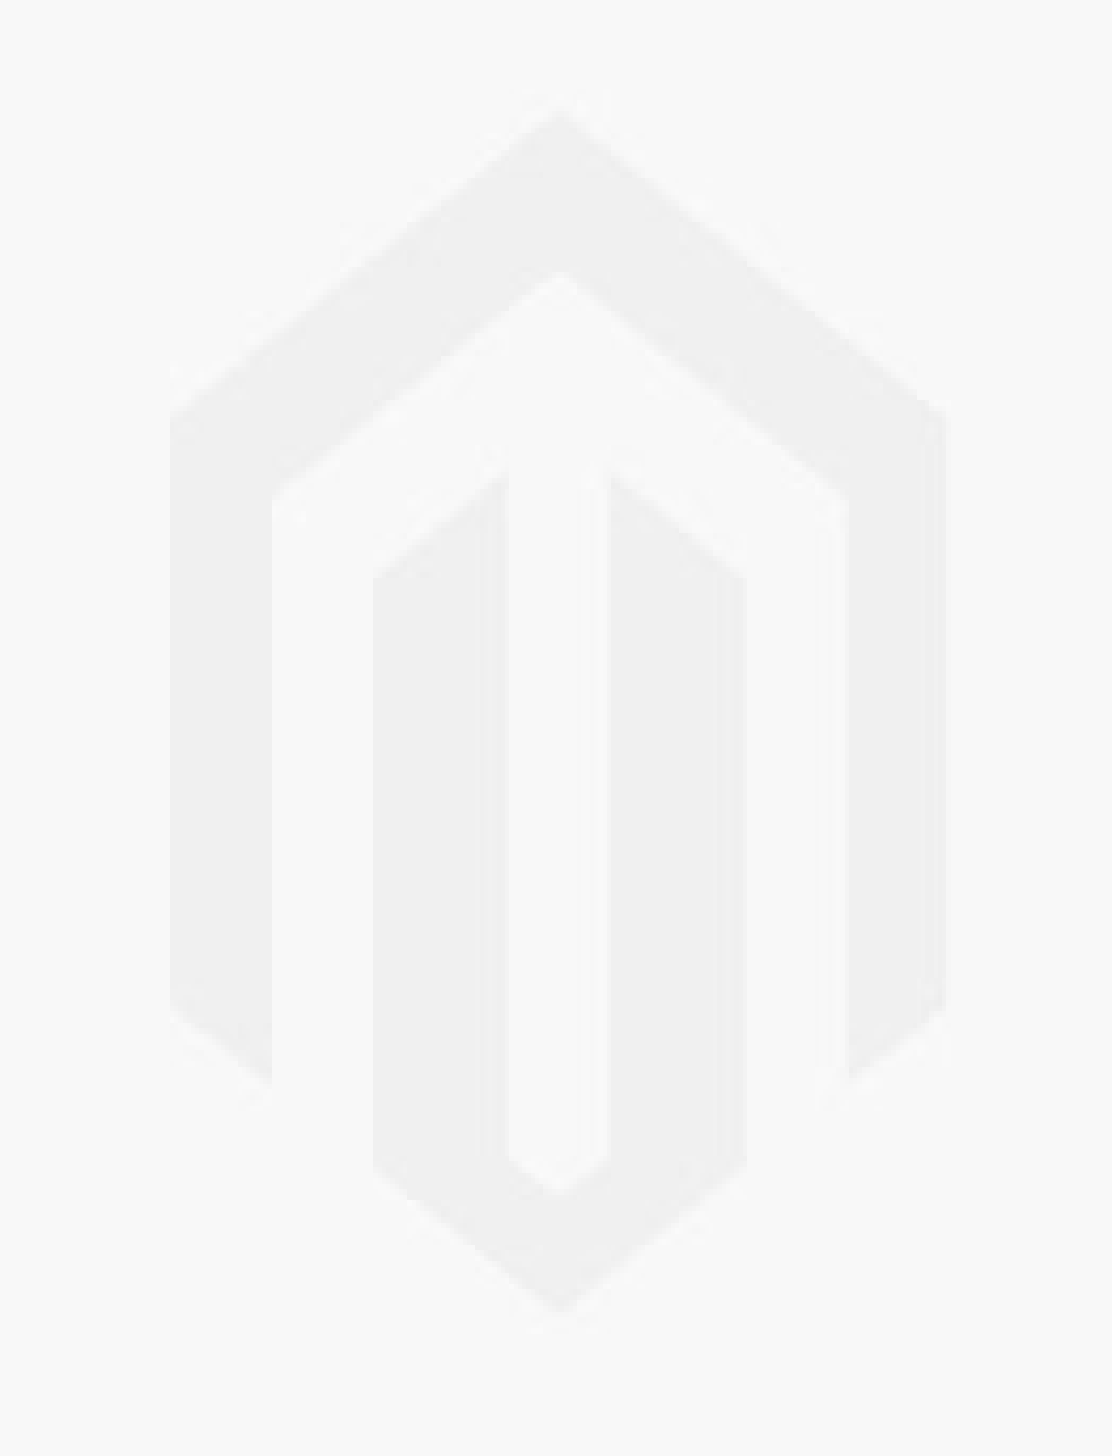 4mm Rose Cut Diamond Center Ouroboros Traditional Stud Image #1